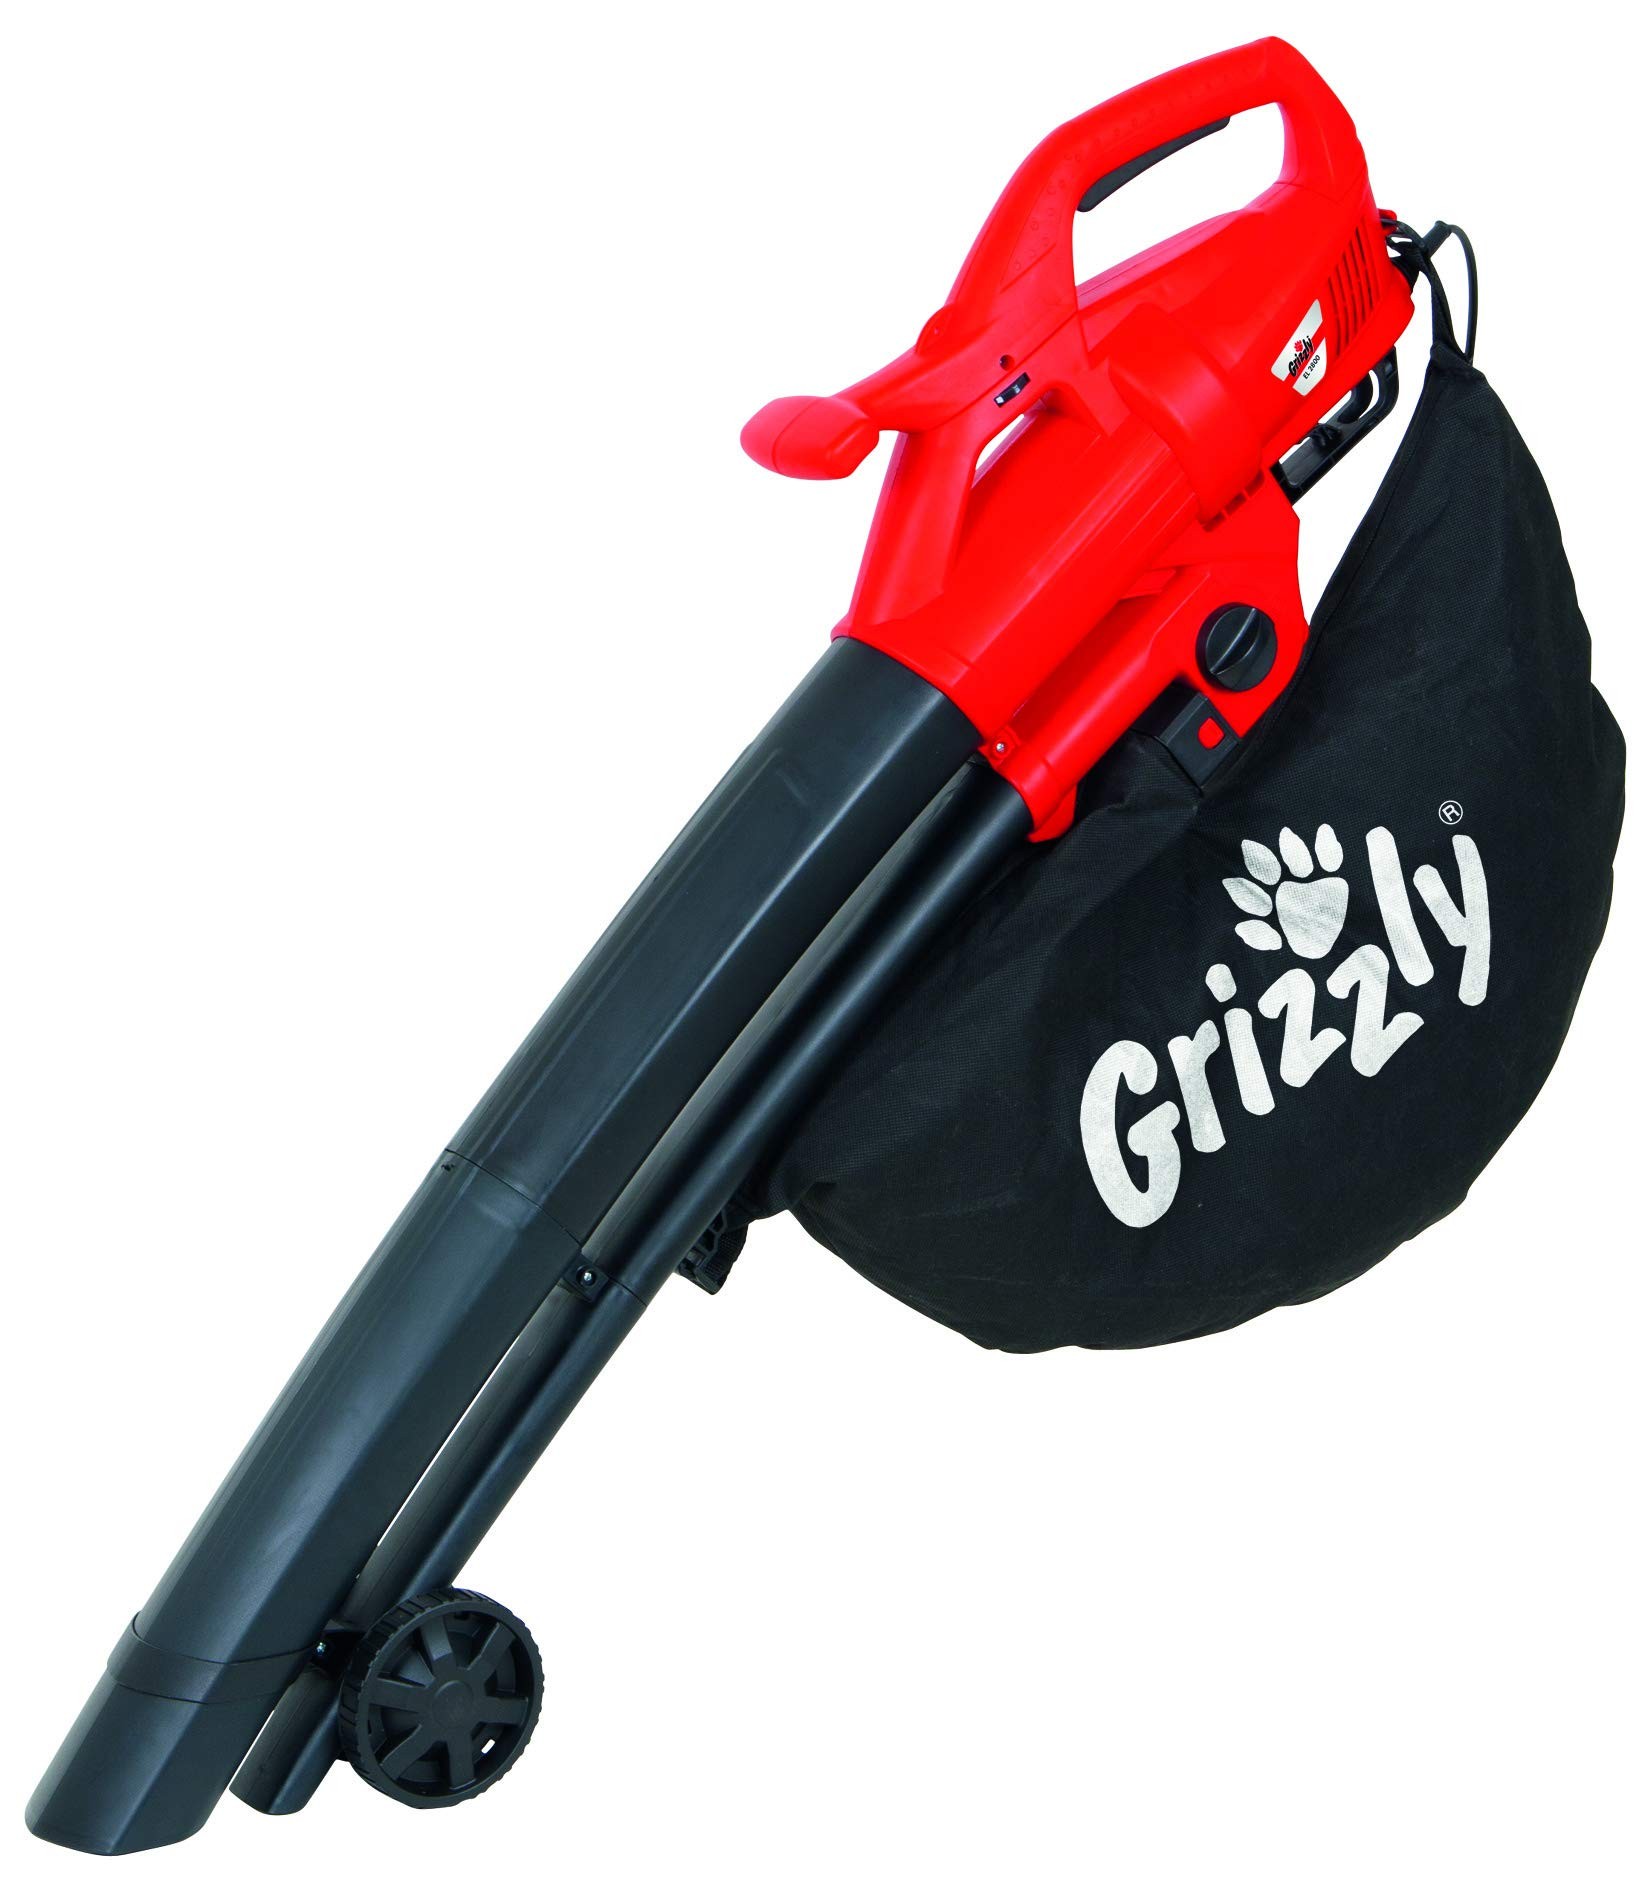 Grizzly Elektro-Laubsauger/Bläser/Häcksler EL 2800, 270 km/h, inkl. Fangsack/Tragegurt